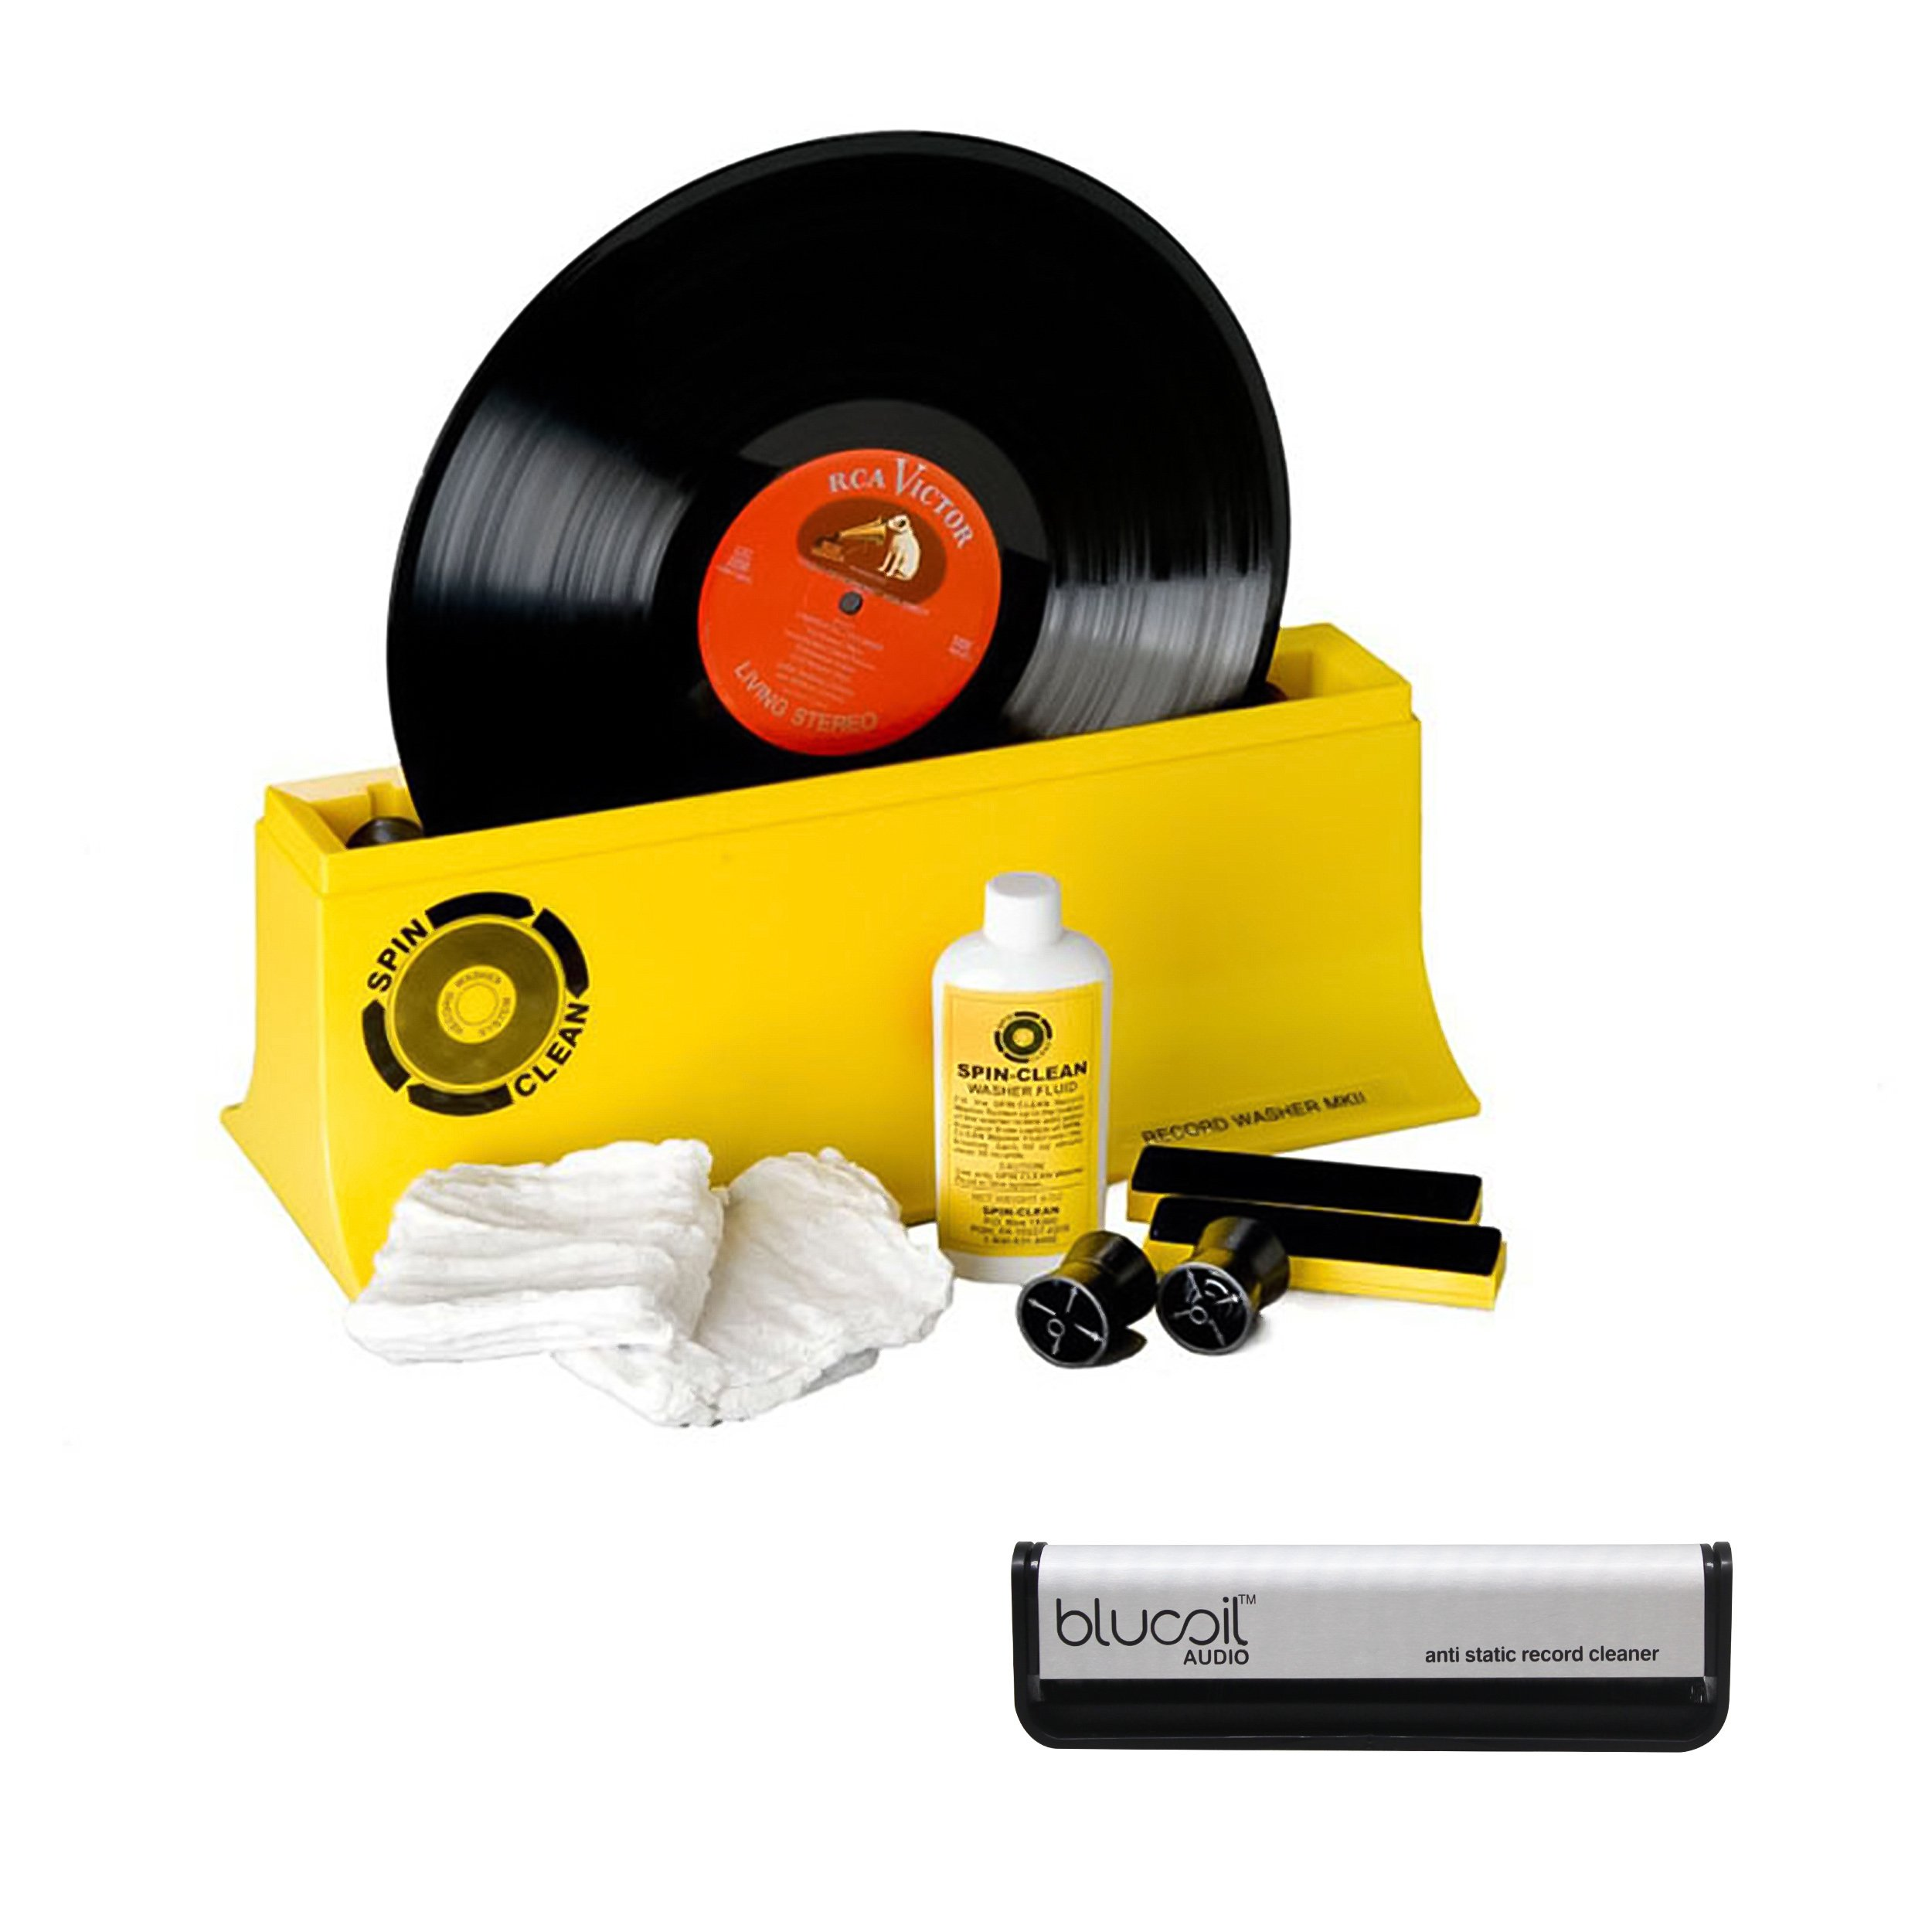 Spin Clean Starter Kit Record Washer System MK2 -PLUS- Blucoil Audio Anti-Static Carbon Fiber Vinyl LP Record Cleaning Brush